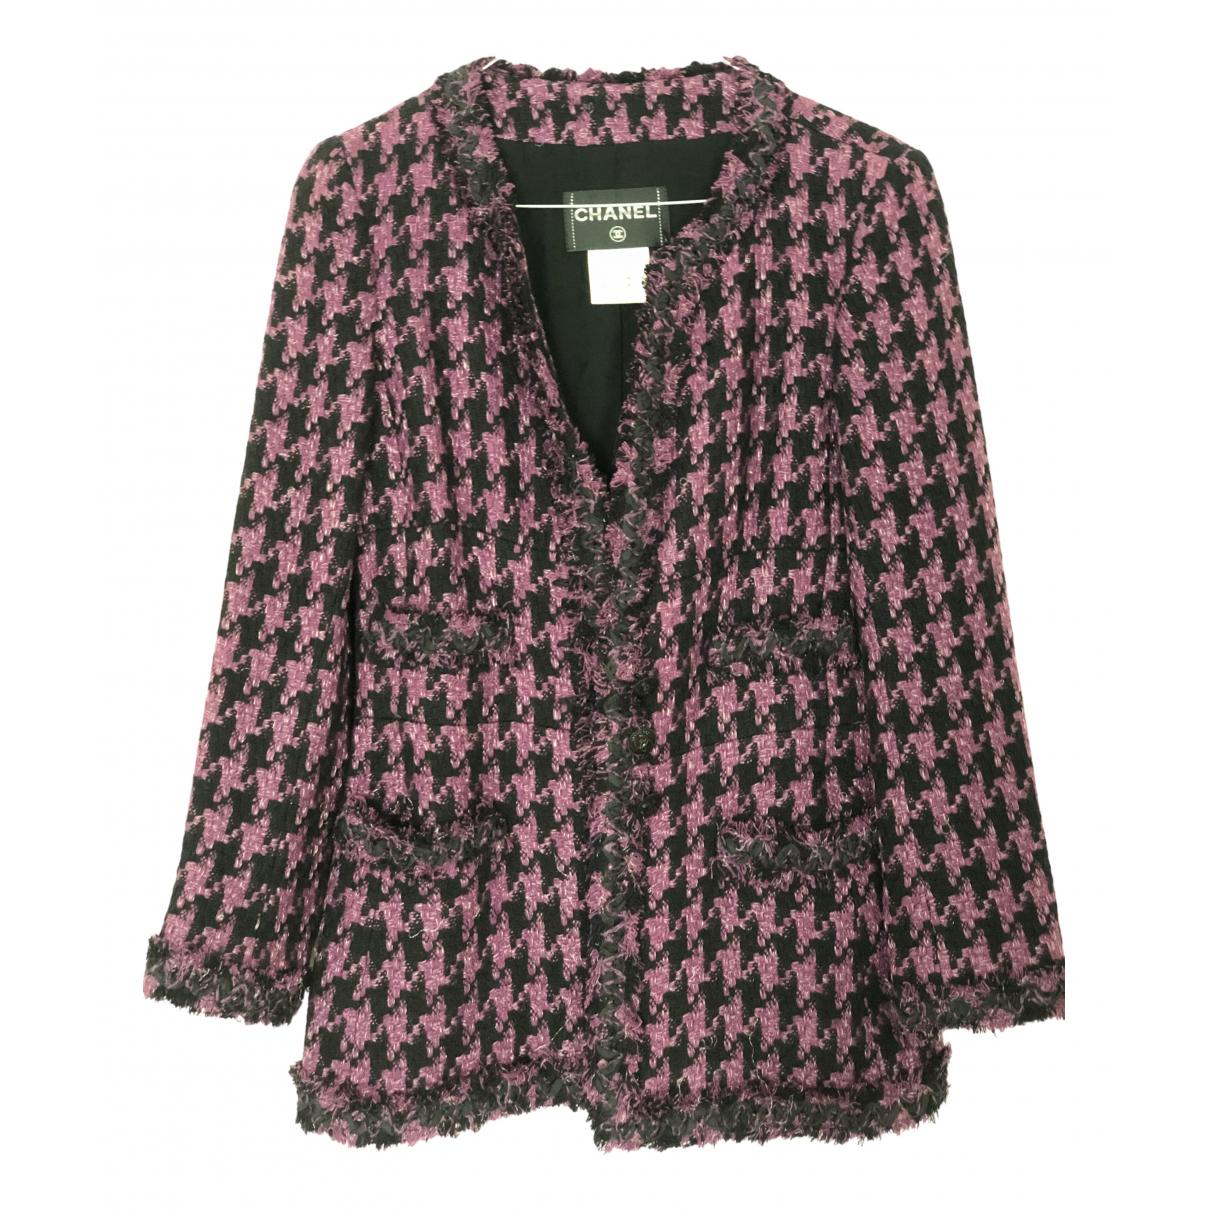 Chanel \N Jacke in  Lila Tweed